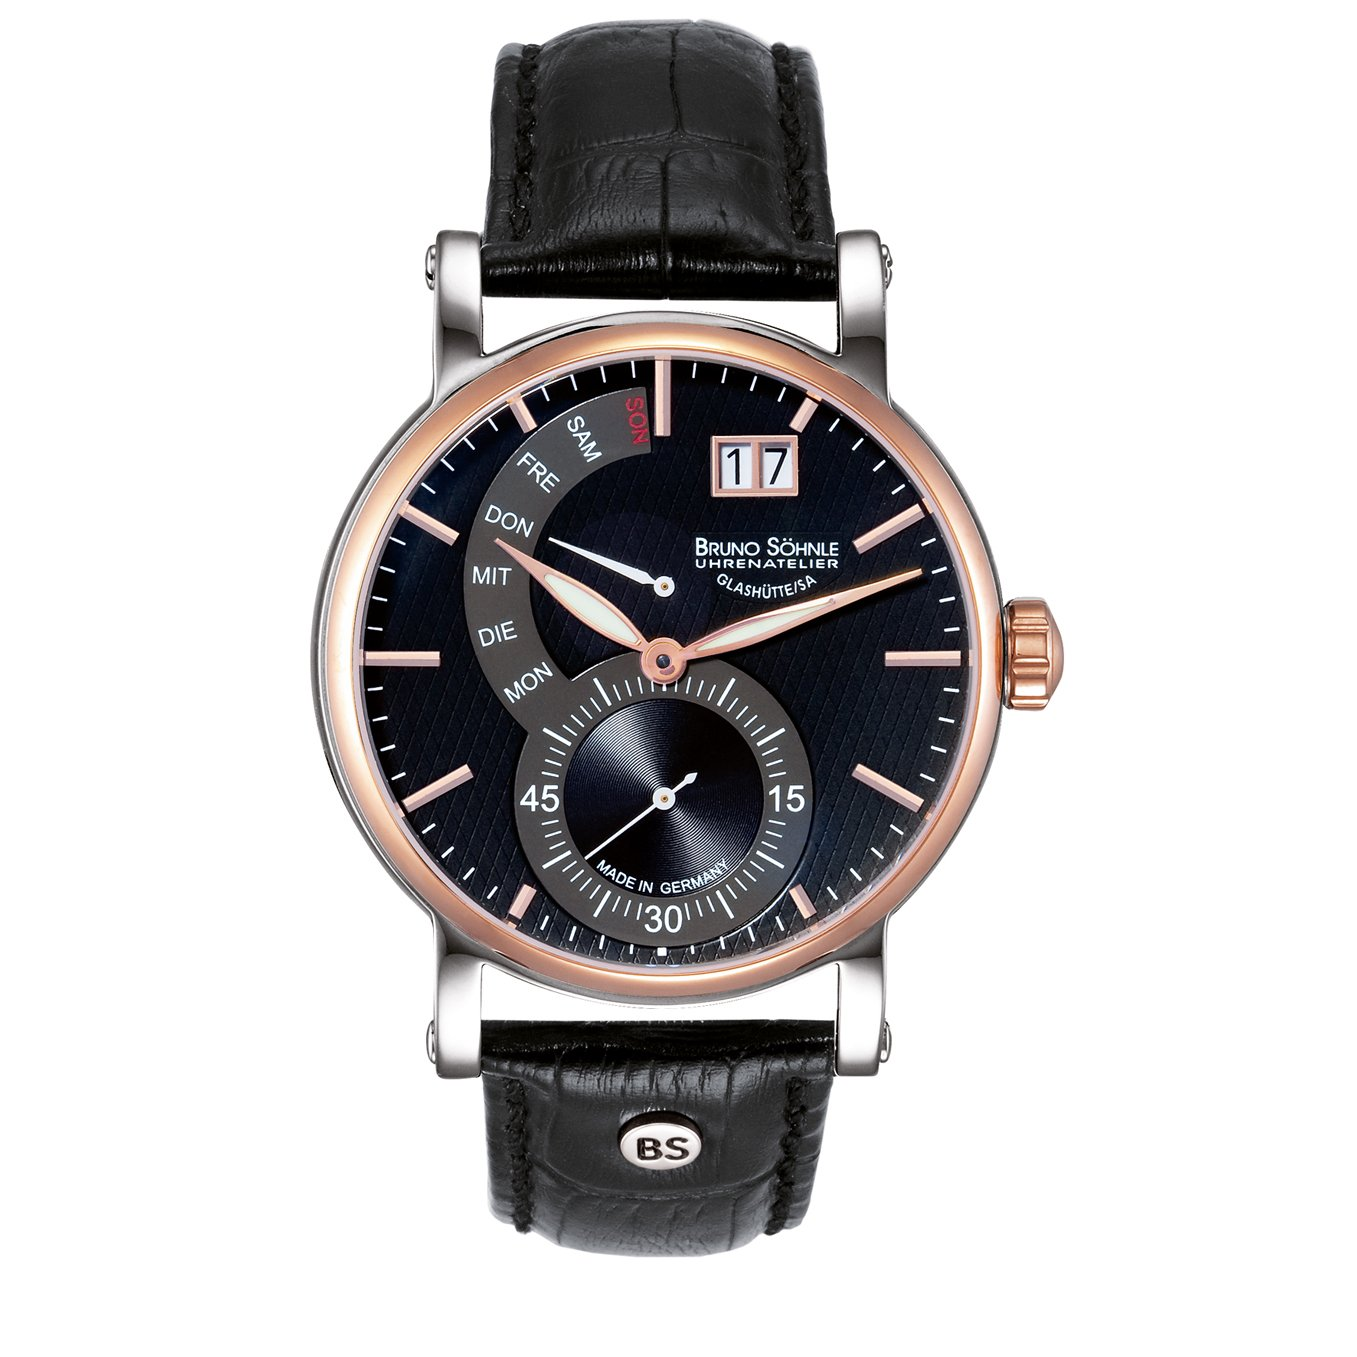 Herren Analog Quarz Uhr mit Leder Armband 17-63073-747